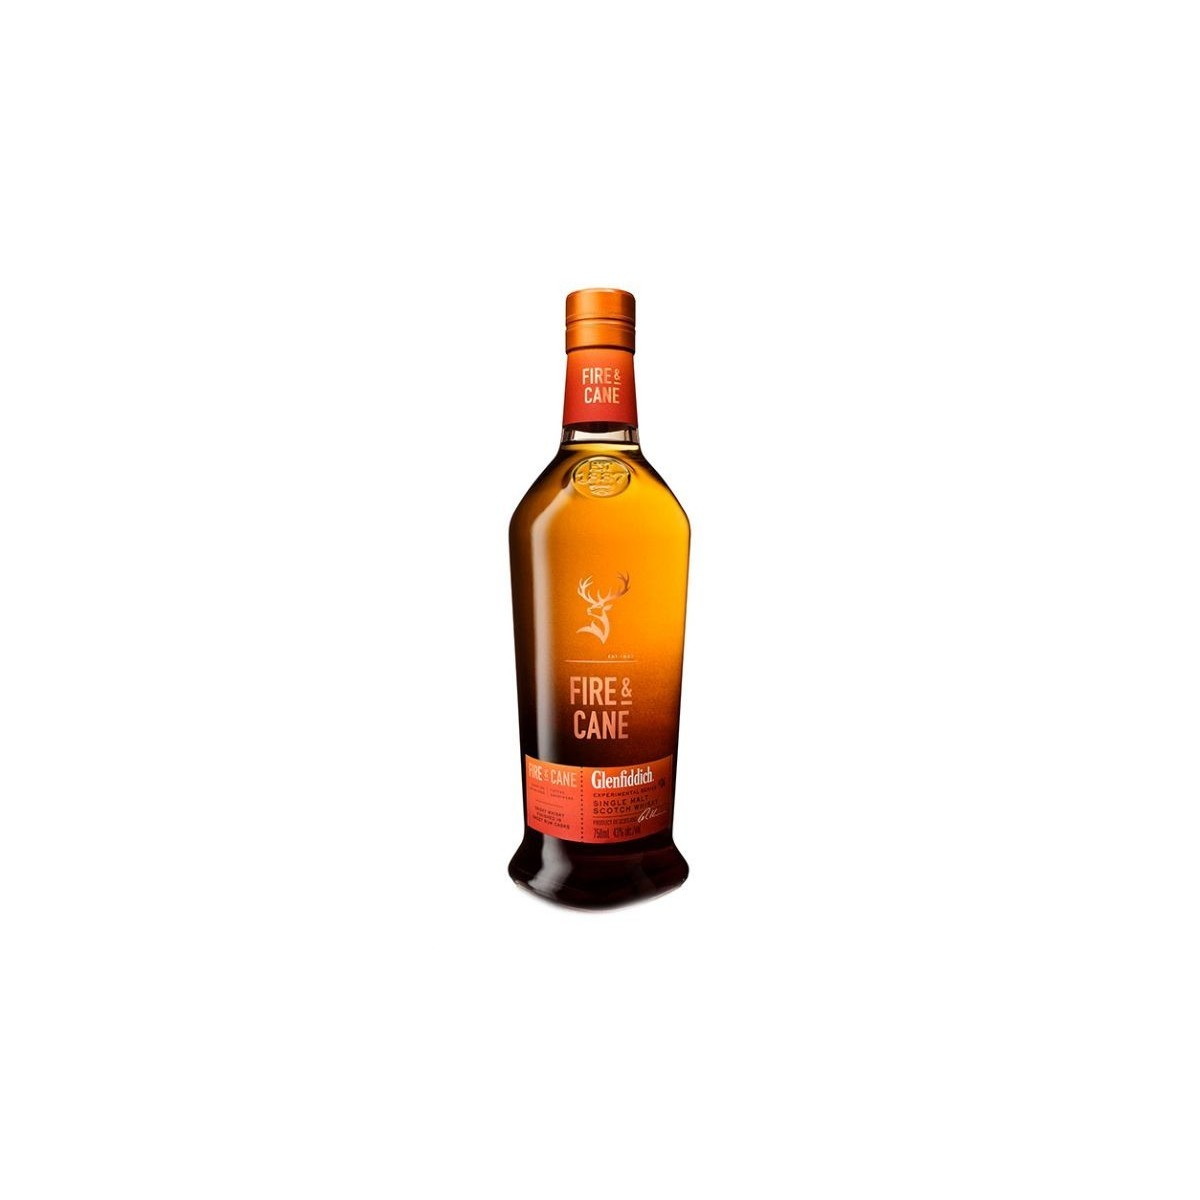 Whisky Glenfiddich Fire & Cane